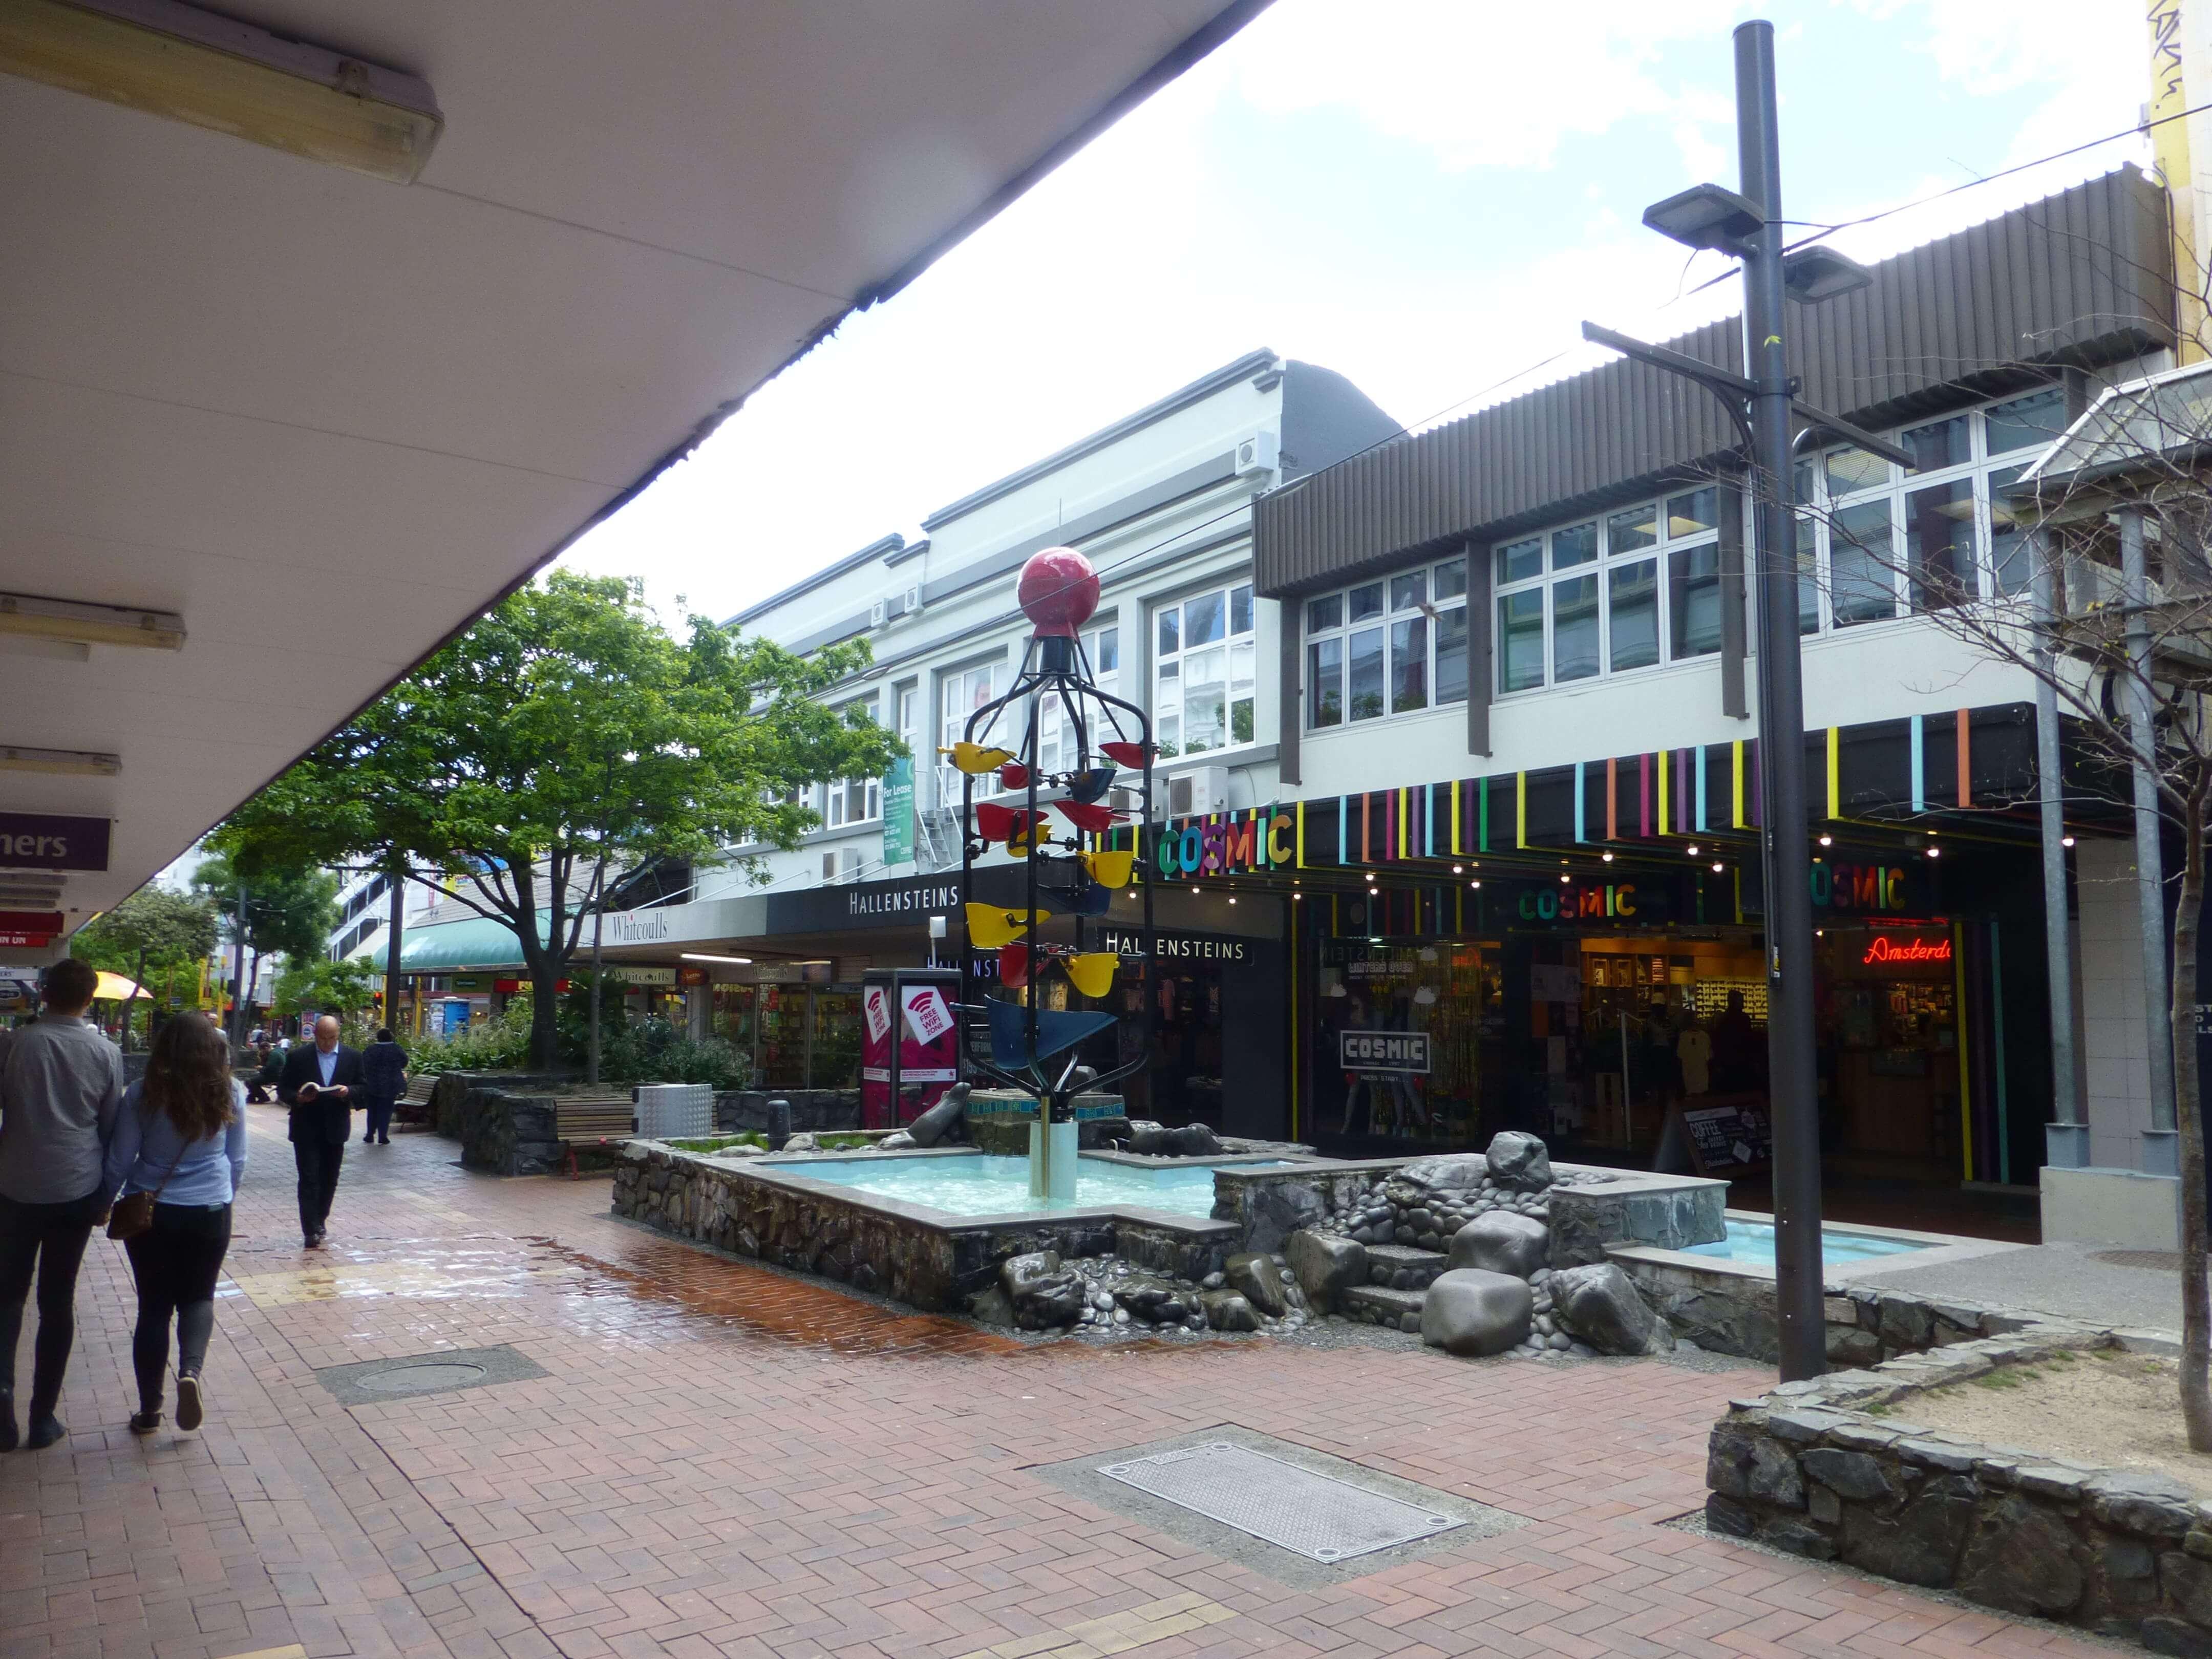 im Zentrum, Wellington, Neuseeland, Weit-weg.reisen 10